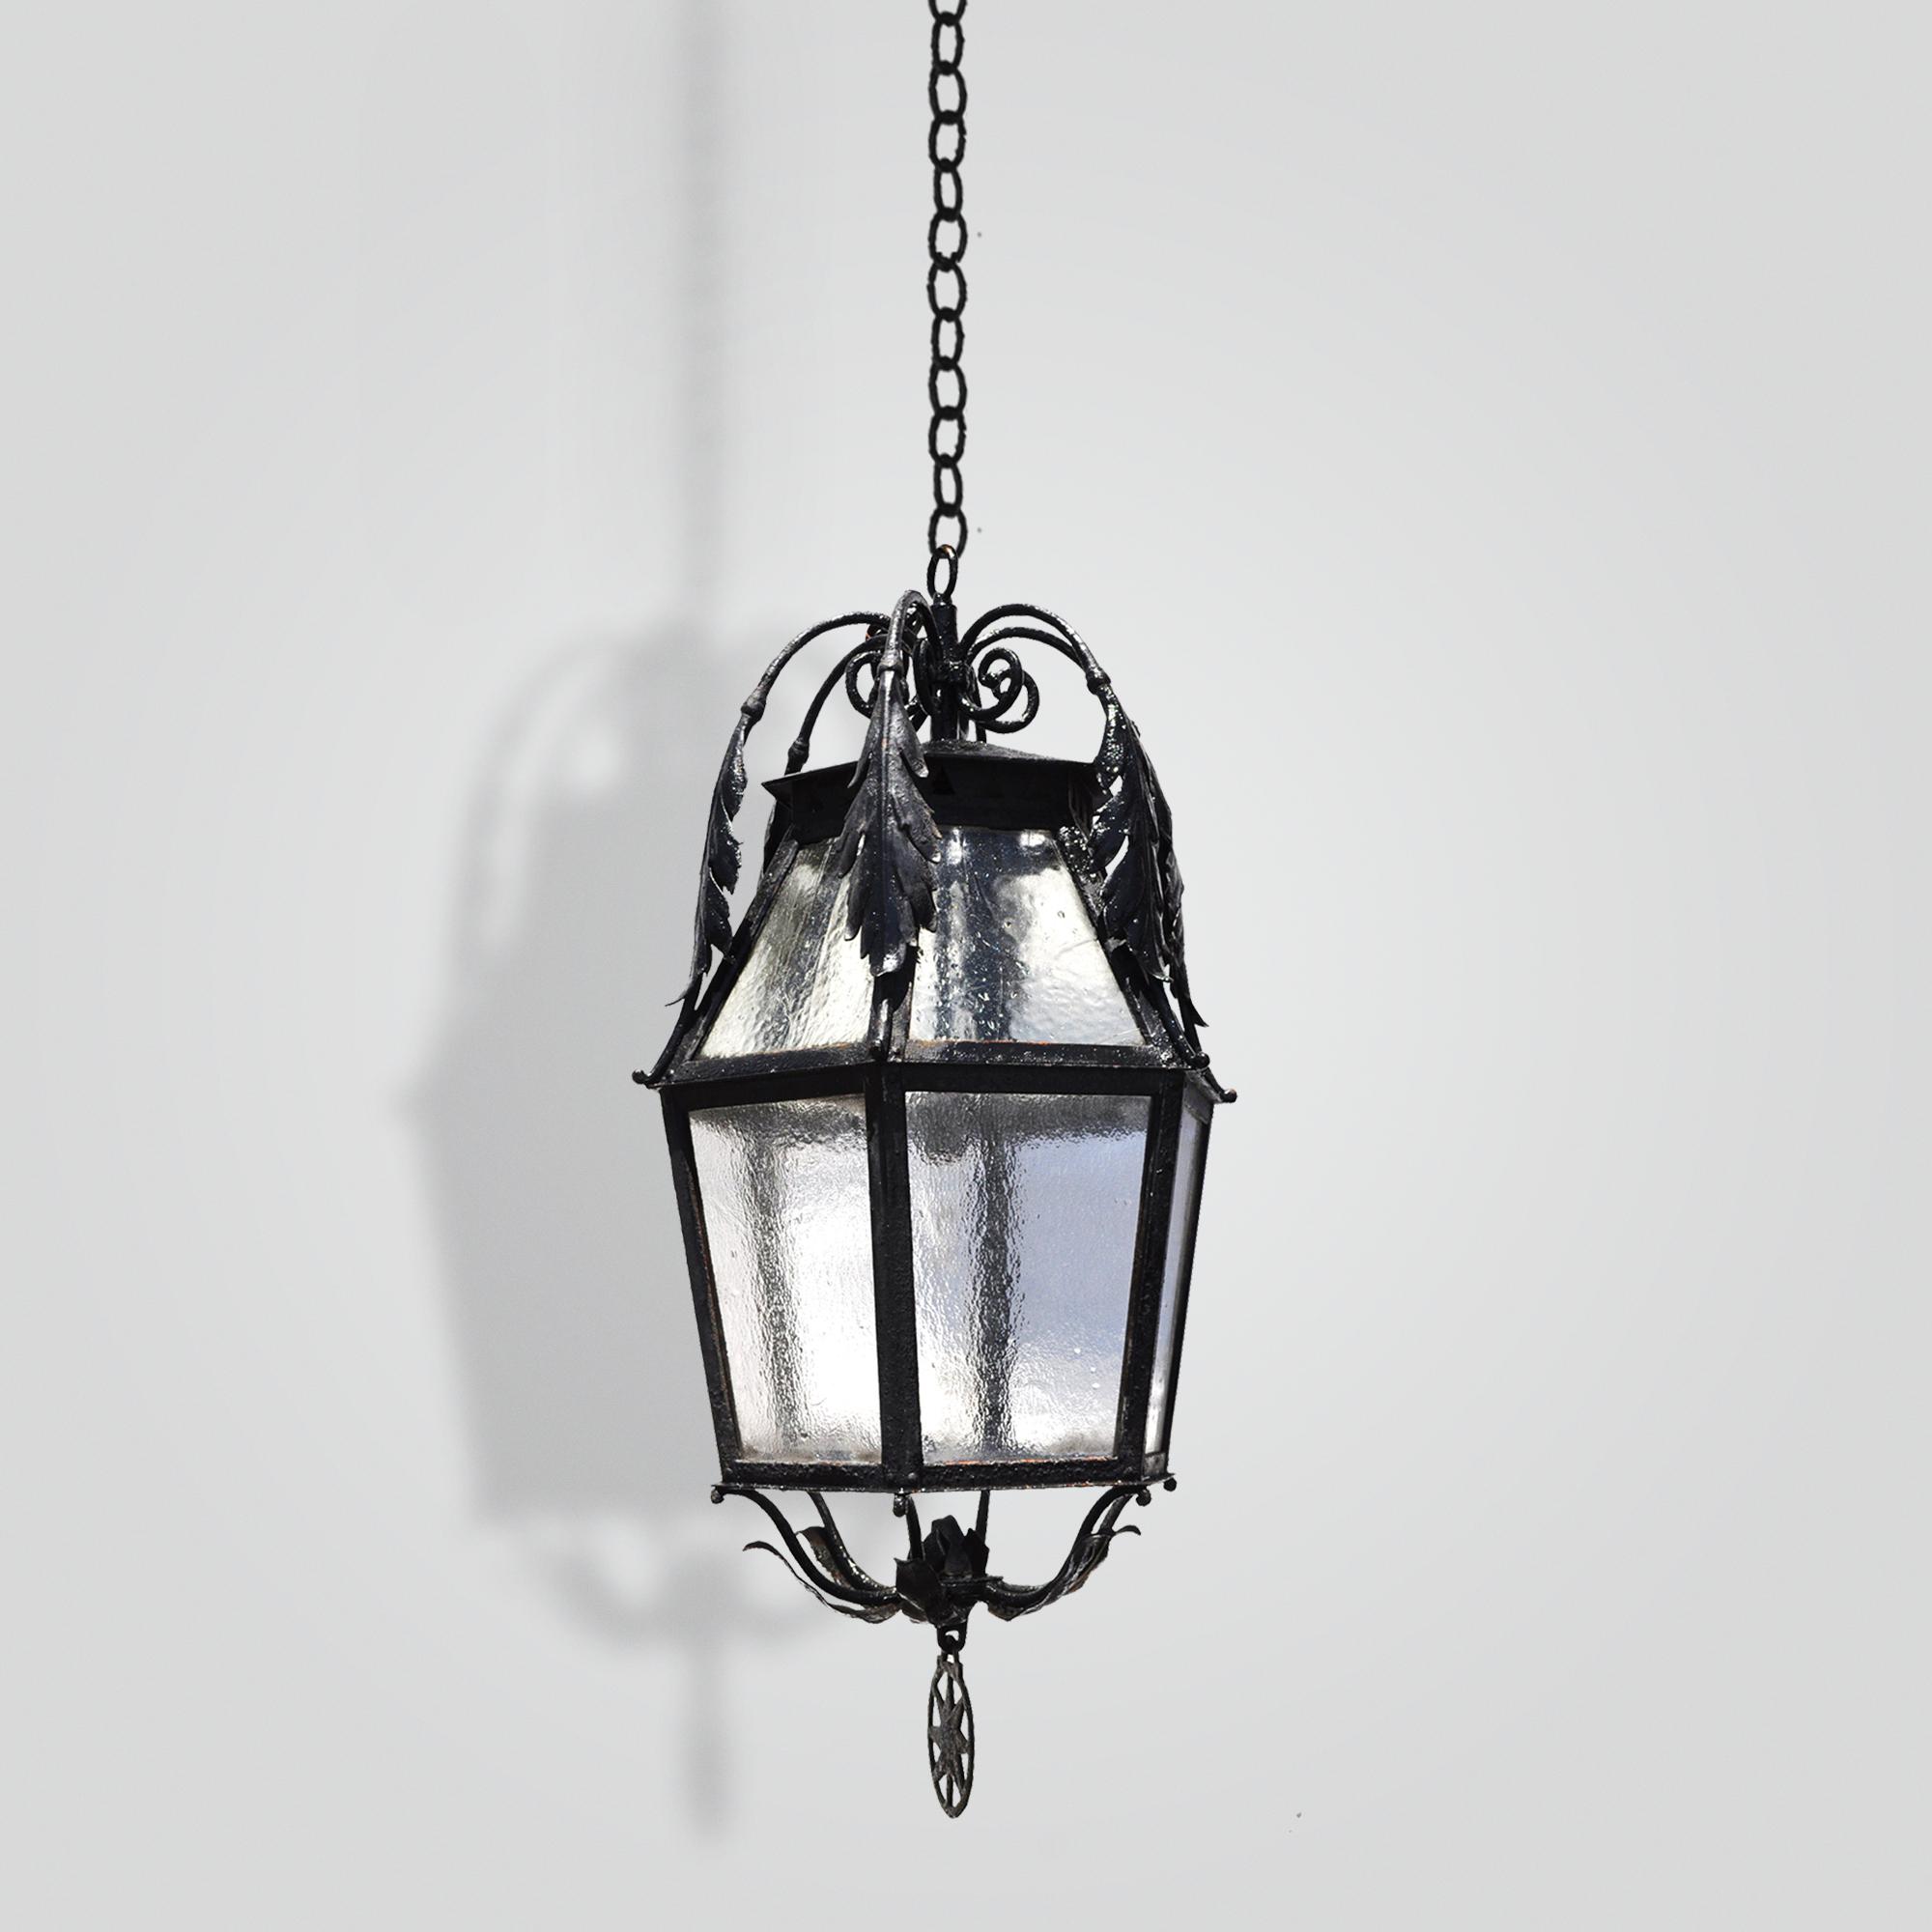 1090-mb1-ir-h-ba-hollywood-pendant-lantern – ADG Lighting Collection